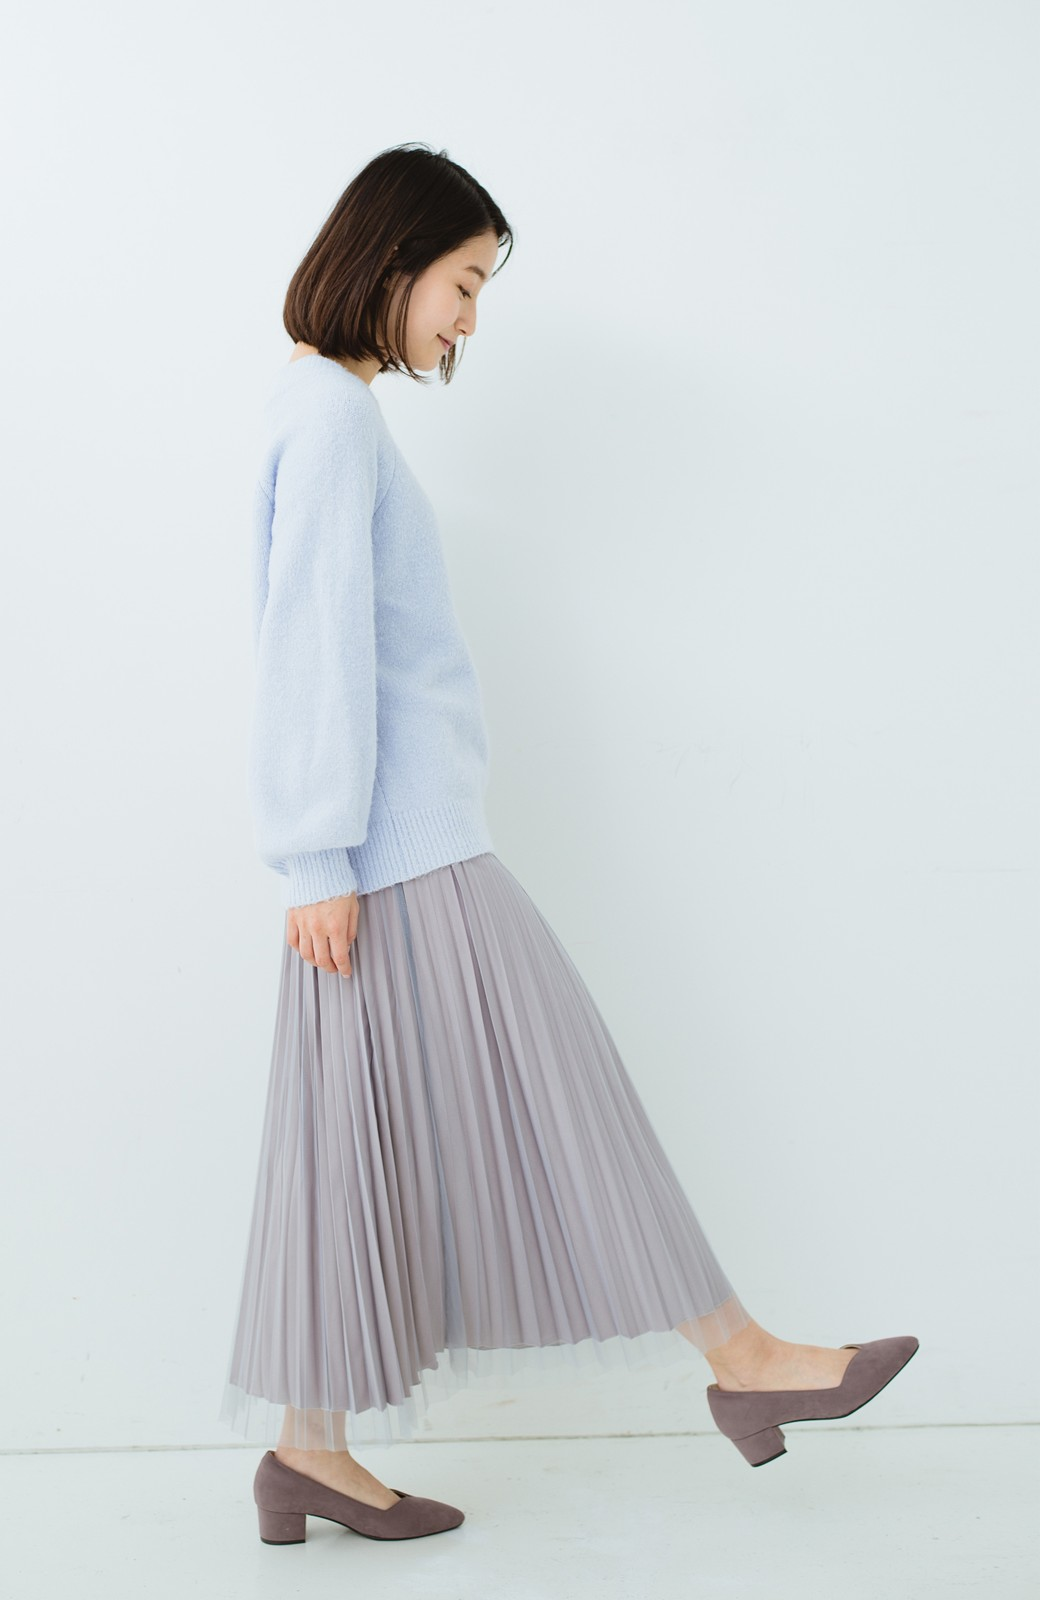 haco! どんな日も華やか気分にしてくれる 二枚仕立てのチュールプリーツスカート <ライトグレー>の商品写真21